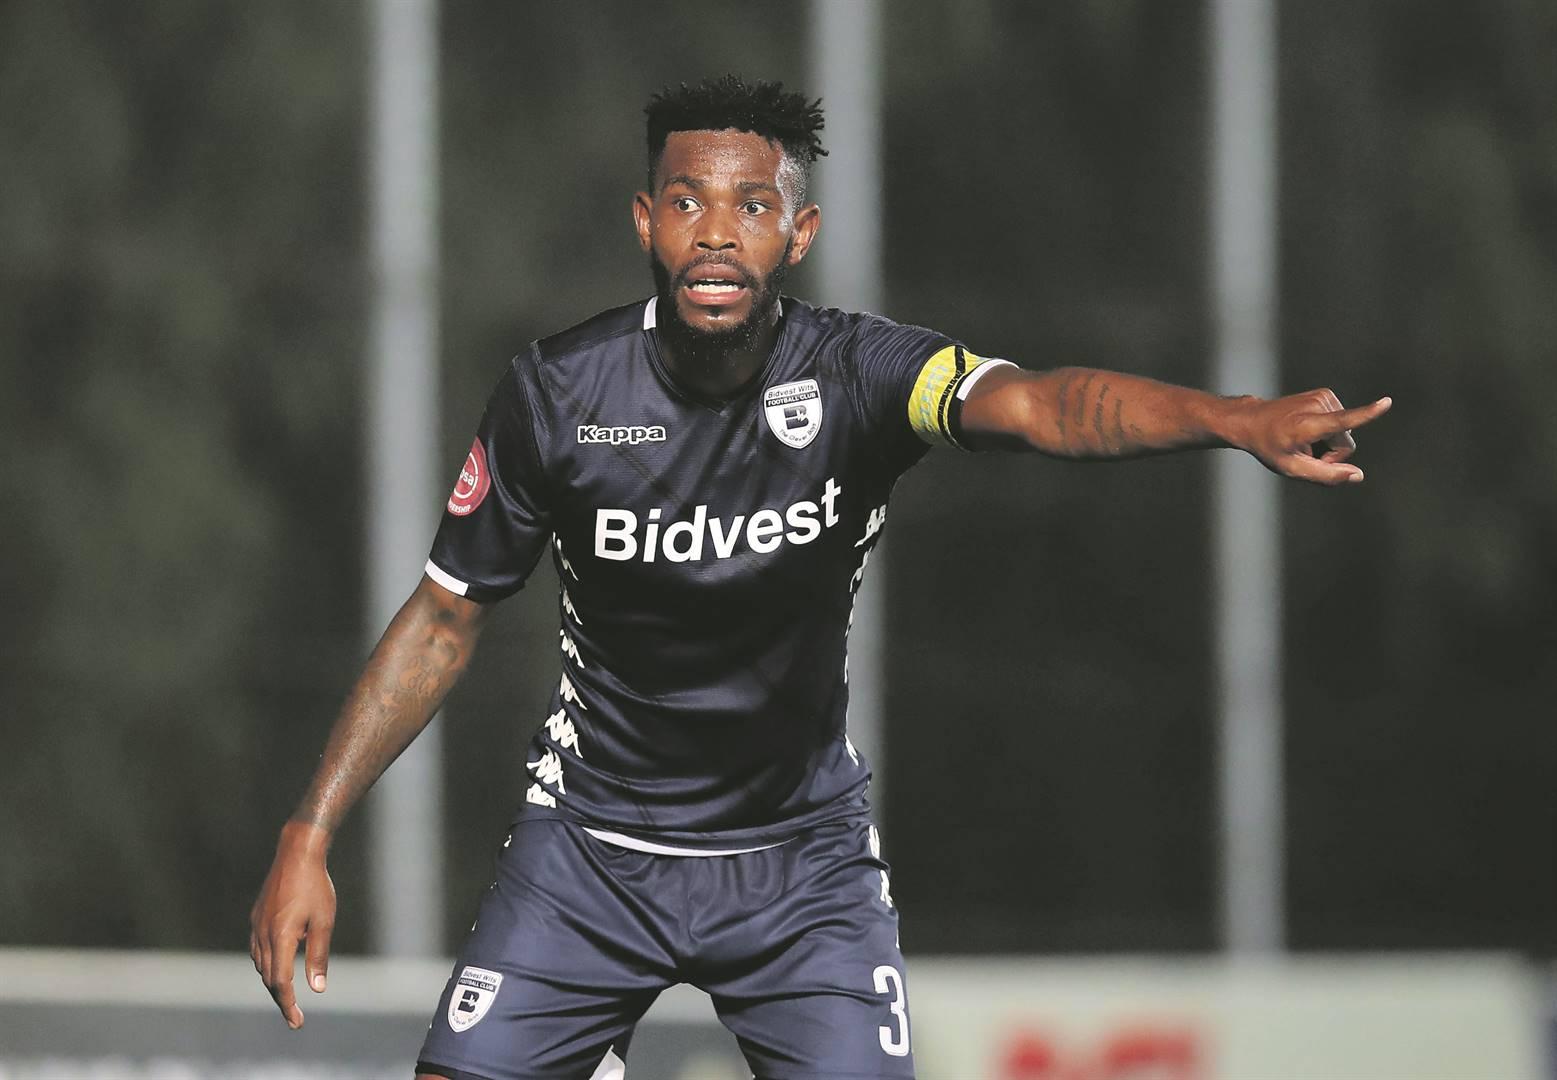 Thulani Hlatshwayo says he needs a new challenge, could he steer Orlando Pirates' ship? Picture: Muzi Ntombela / BackpagePix